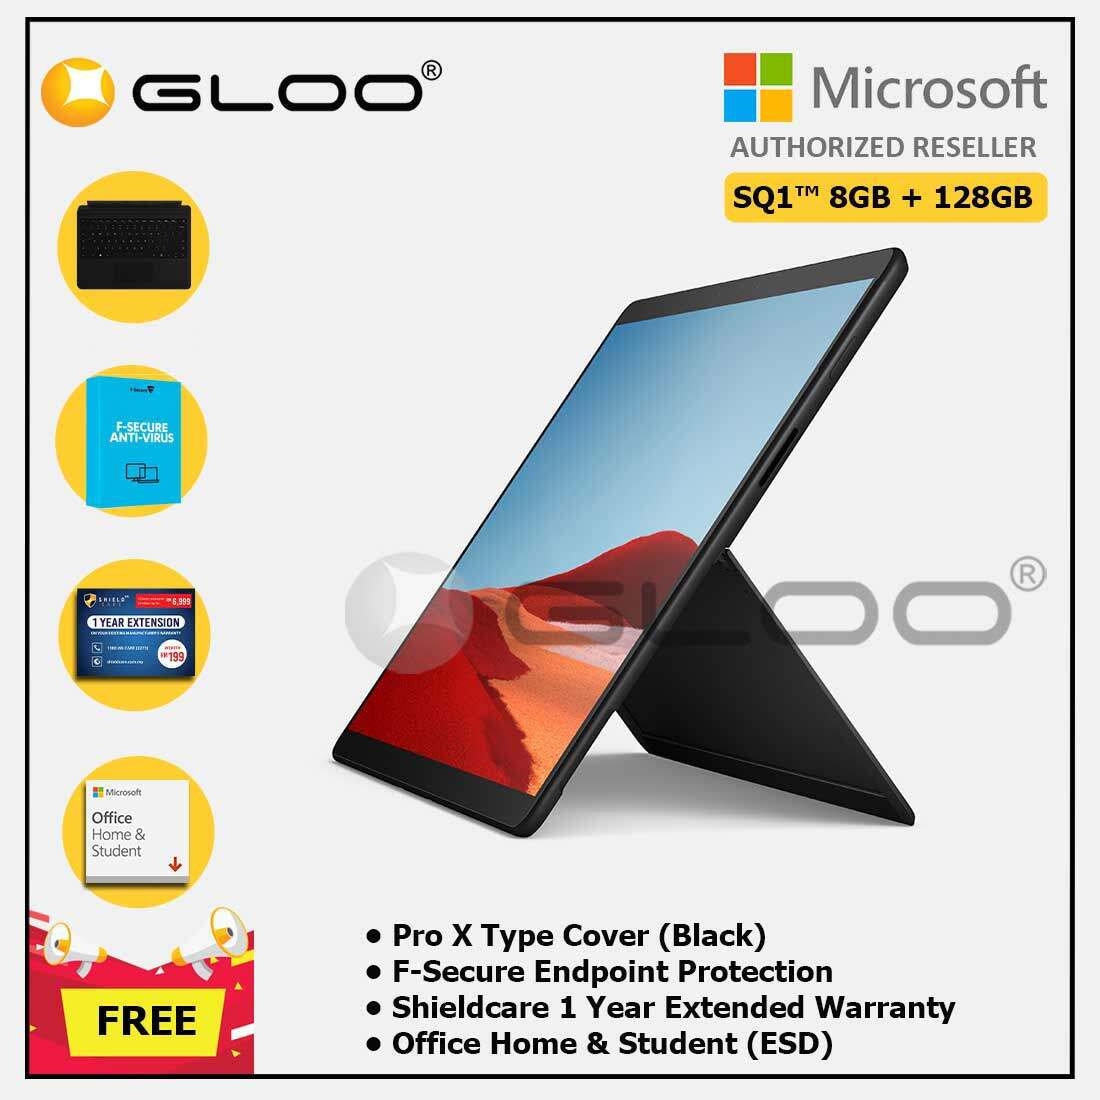 Microsoft Surface Pro X SQ1™/8GB RAM -128GB LTE Black + Pro X TC Black + Shield Care 1 Year + F-Secure 1 Year + Office Home & Student (ESD) Malaysia